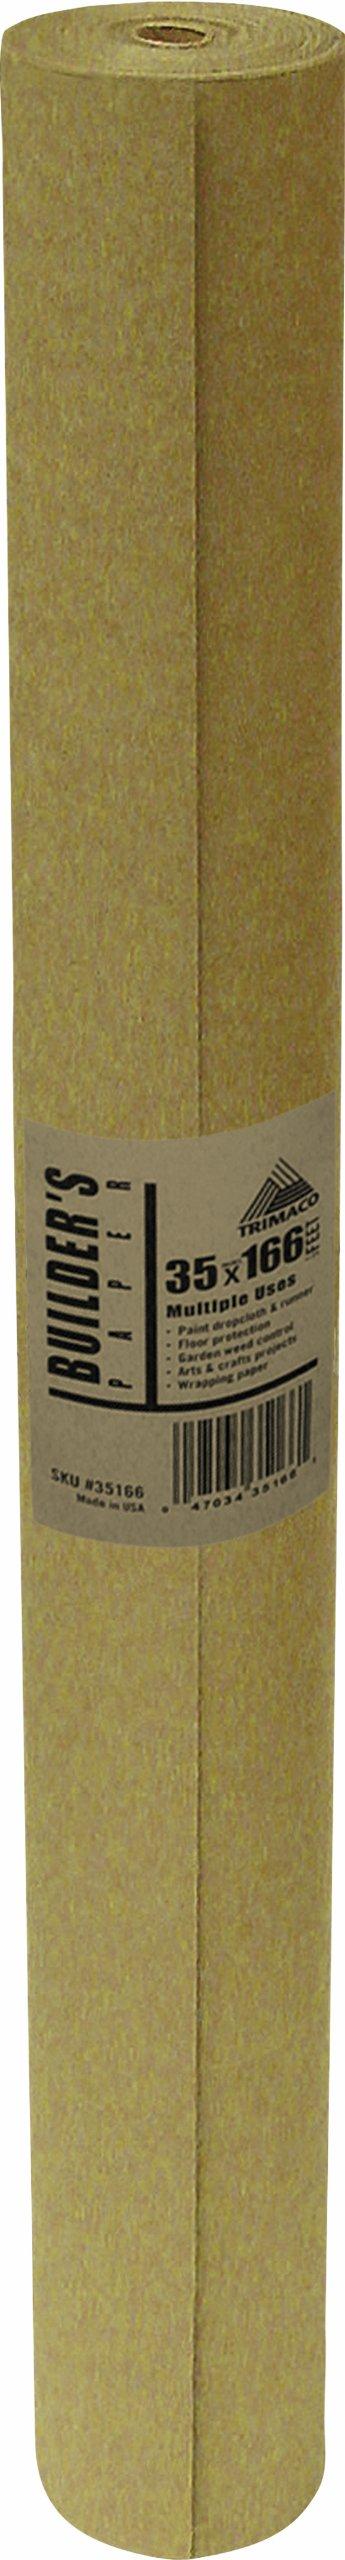 Trimaco Llc BF36 35-Inch by 166-Feet Flooring Paper, Brown